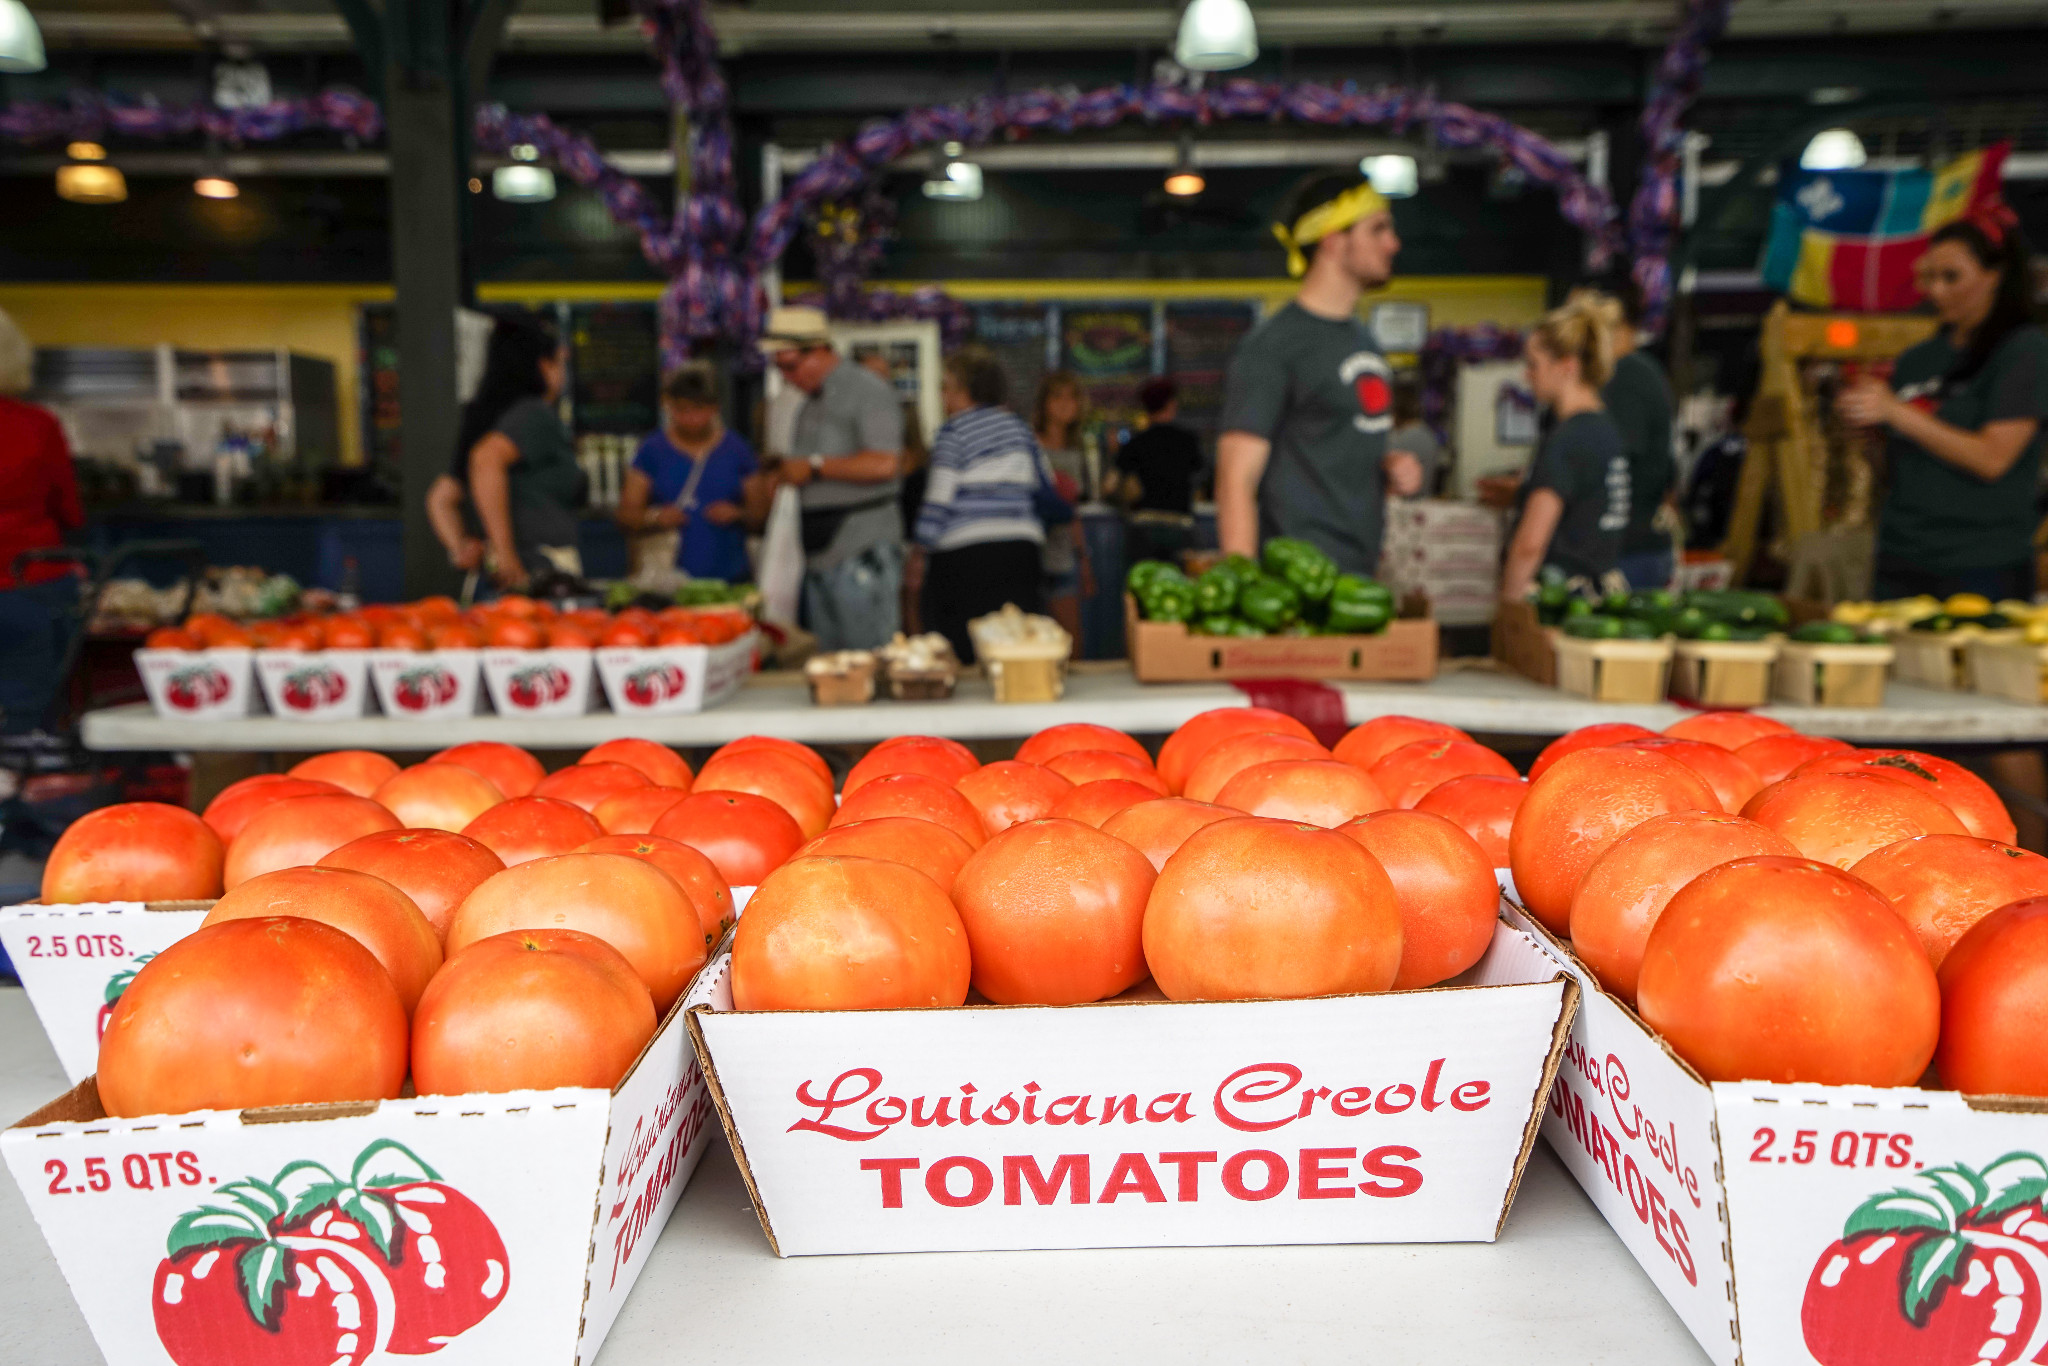 Plenty of Creole tomatoes. (Photo: Paul Broussard)